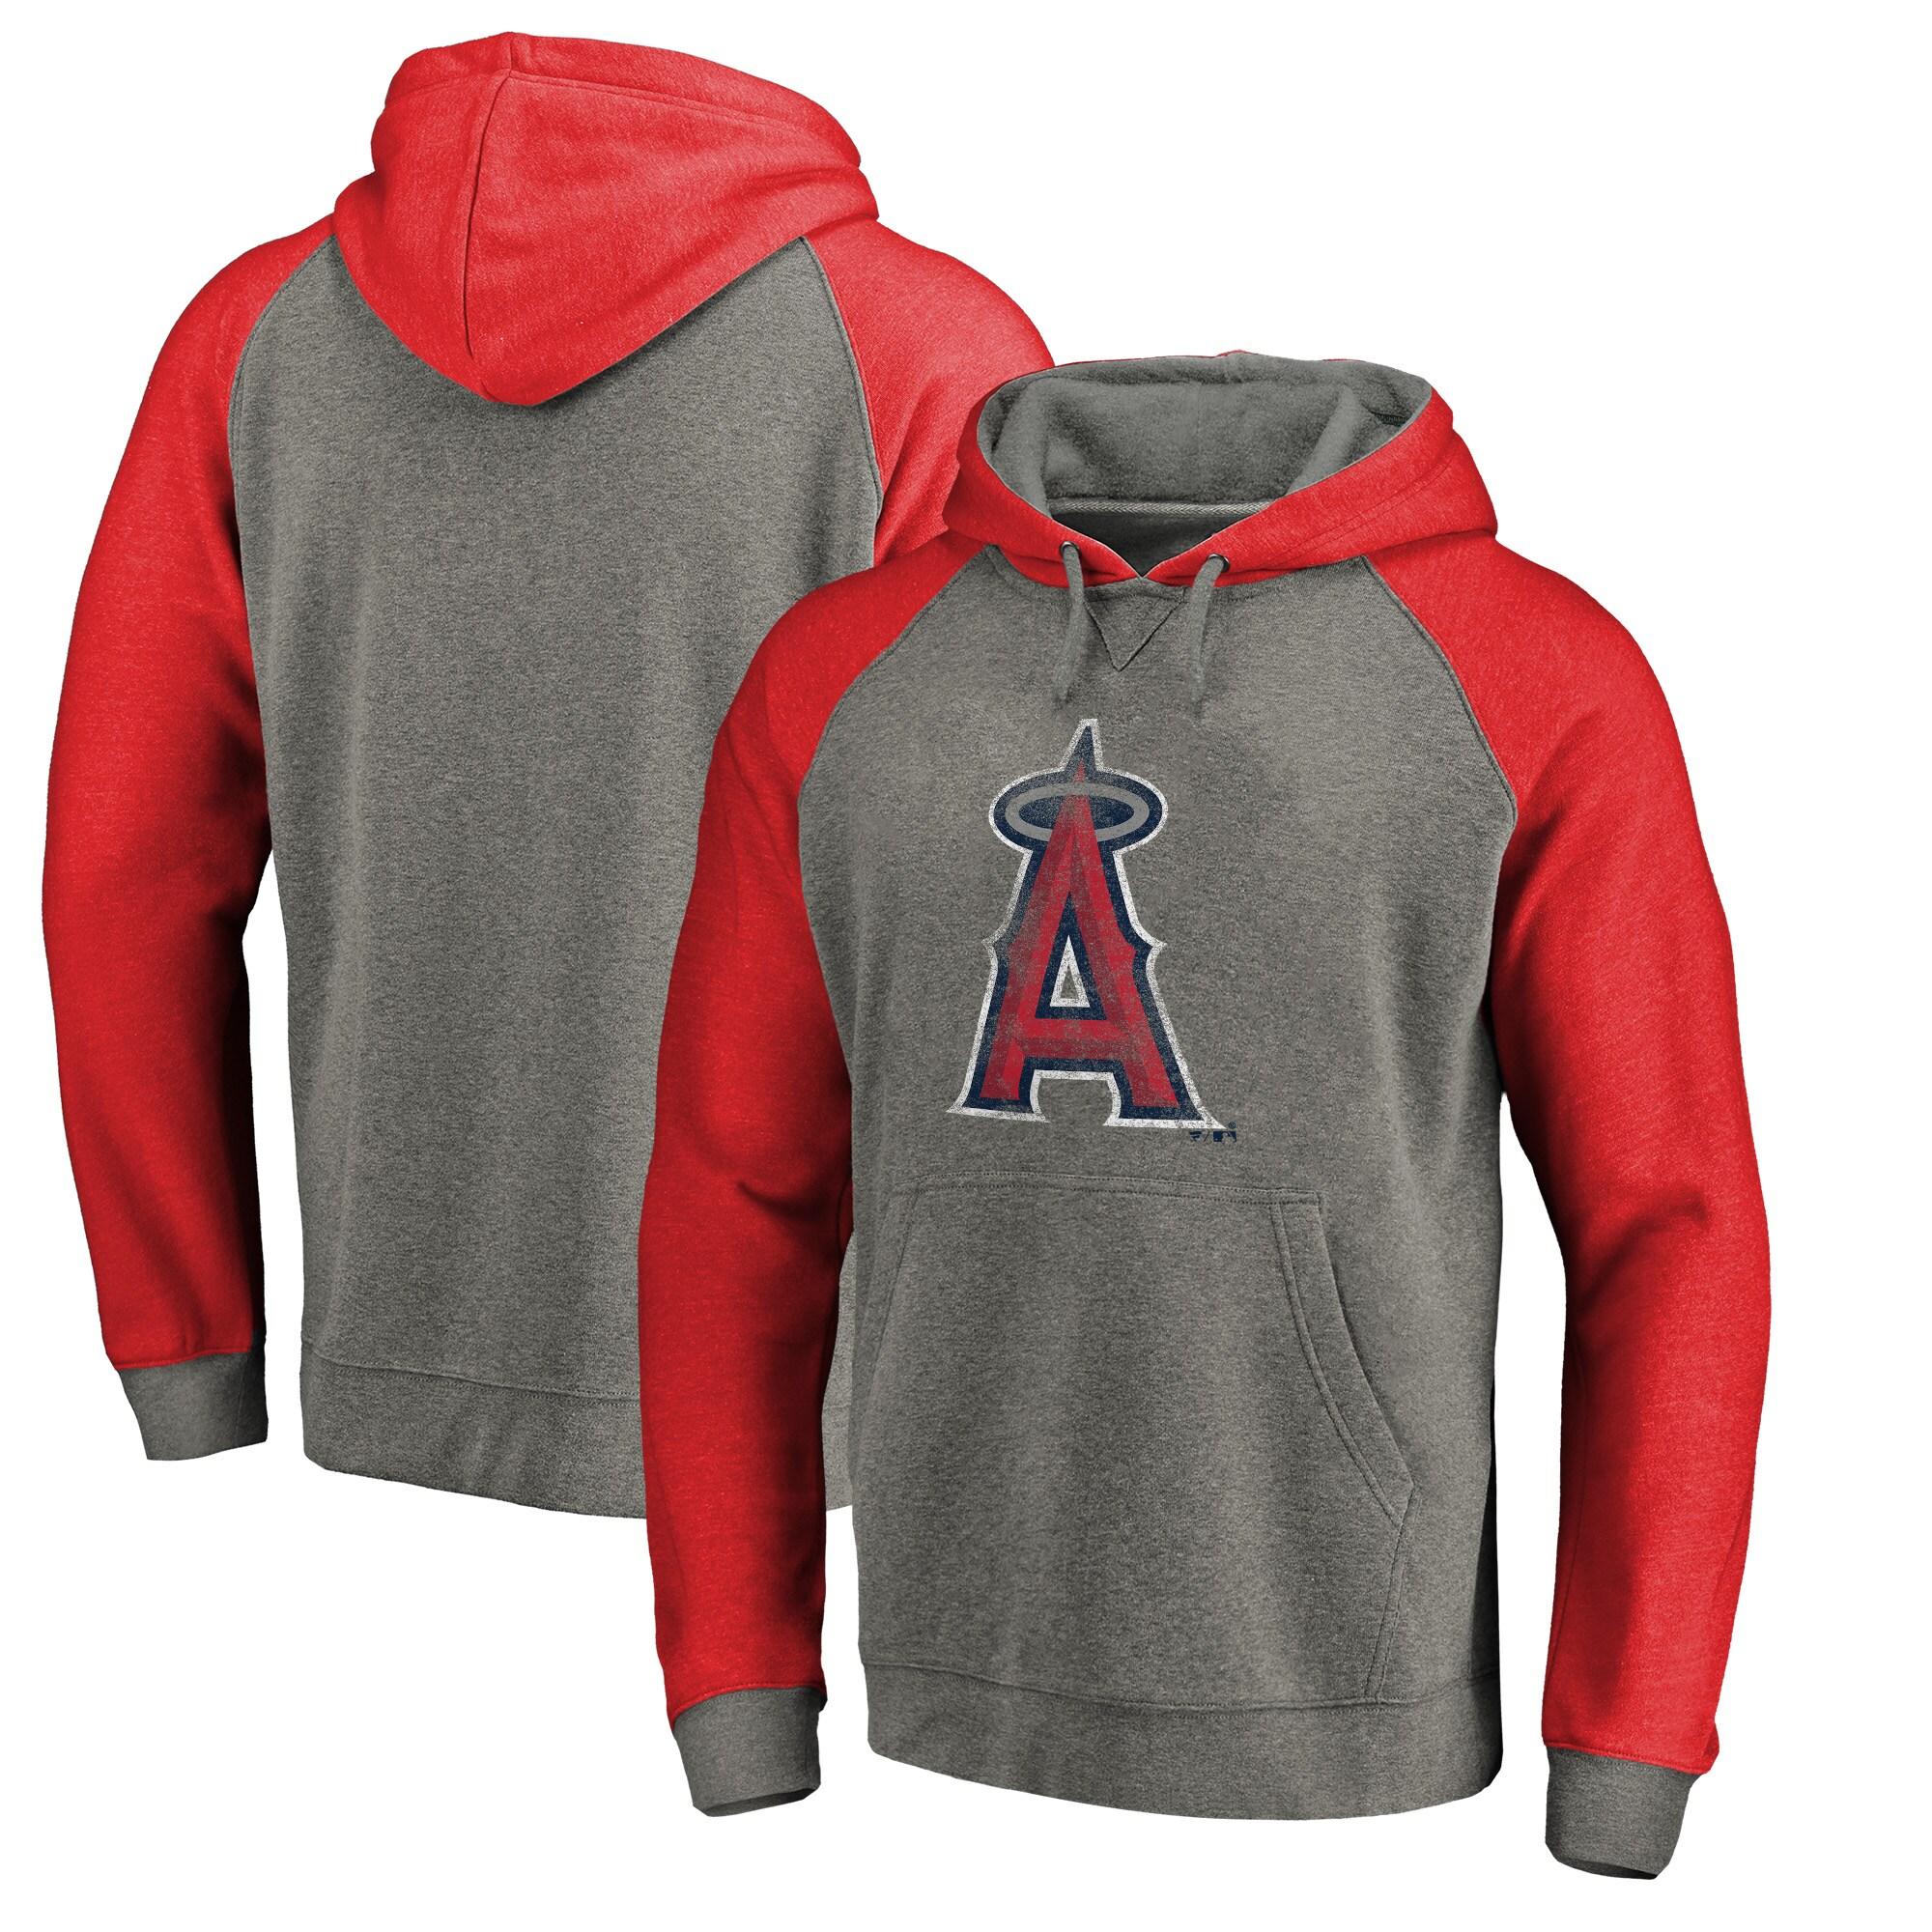 Los Angeles Angels Fanatics Branded Distressed Team Logo Tri-Blend Big & Tall Raglan Pullover Hoodie - Gray/Red